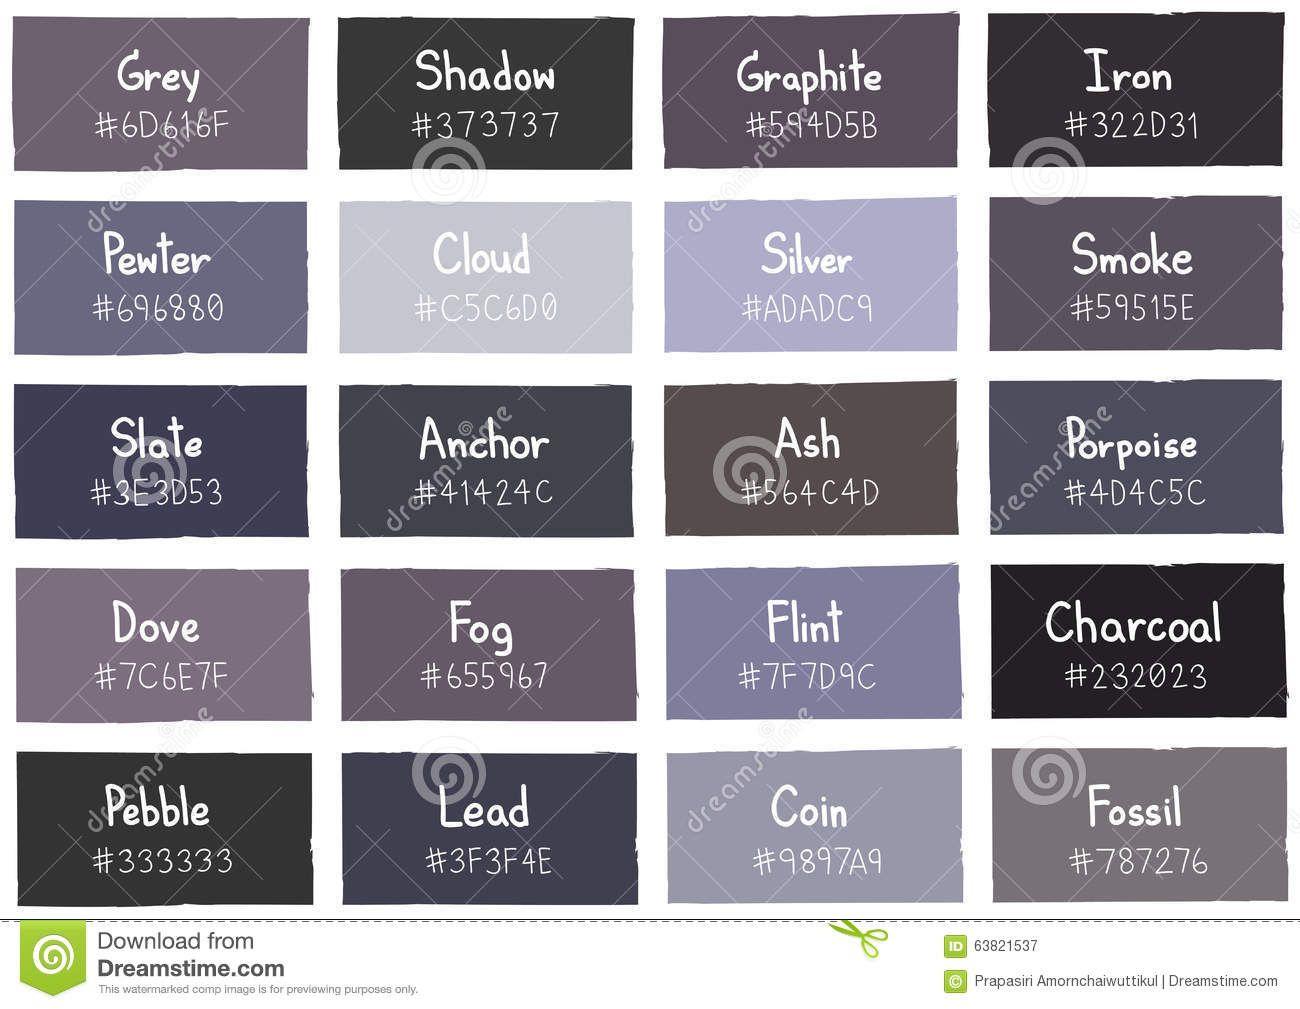 Grey Name 的圖片搜尋結果